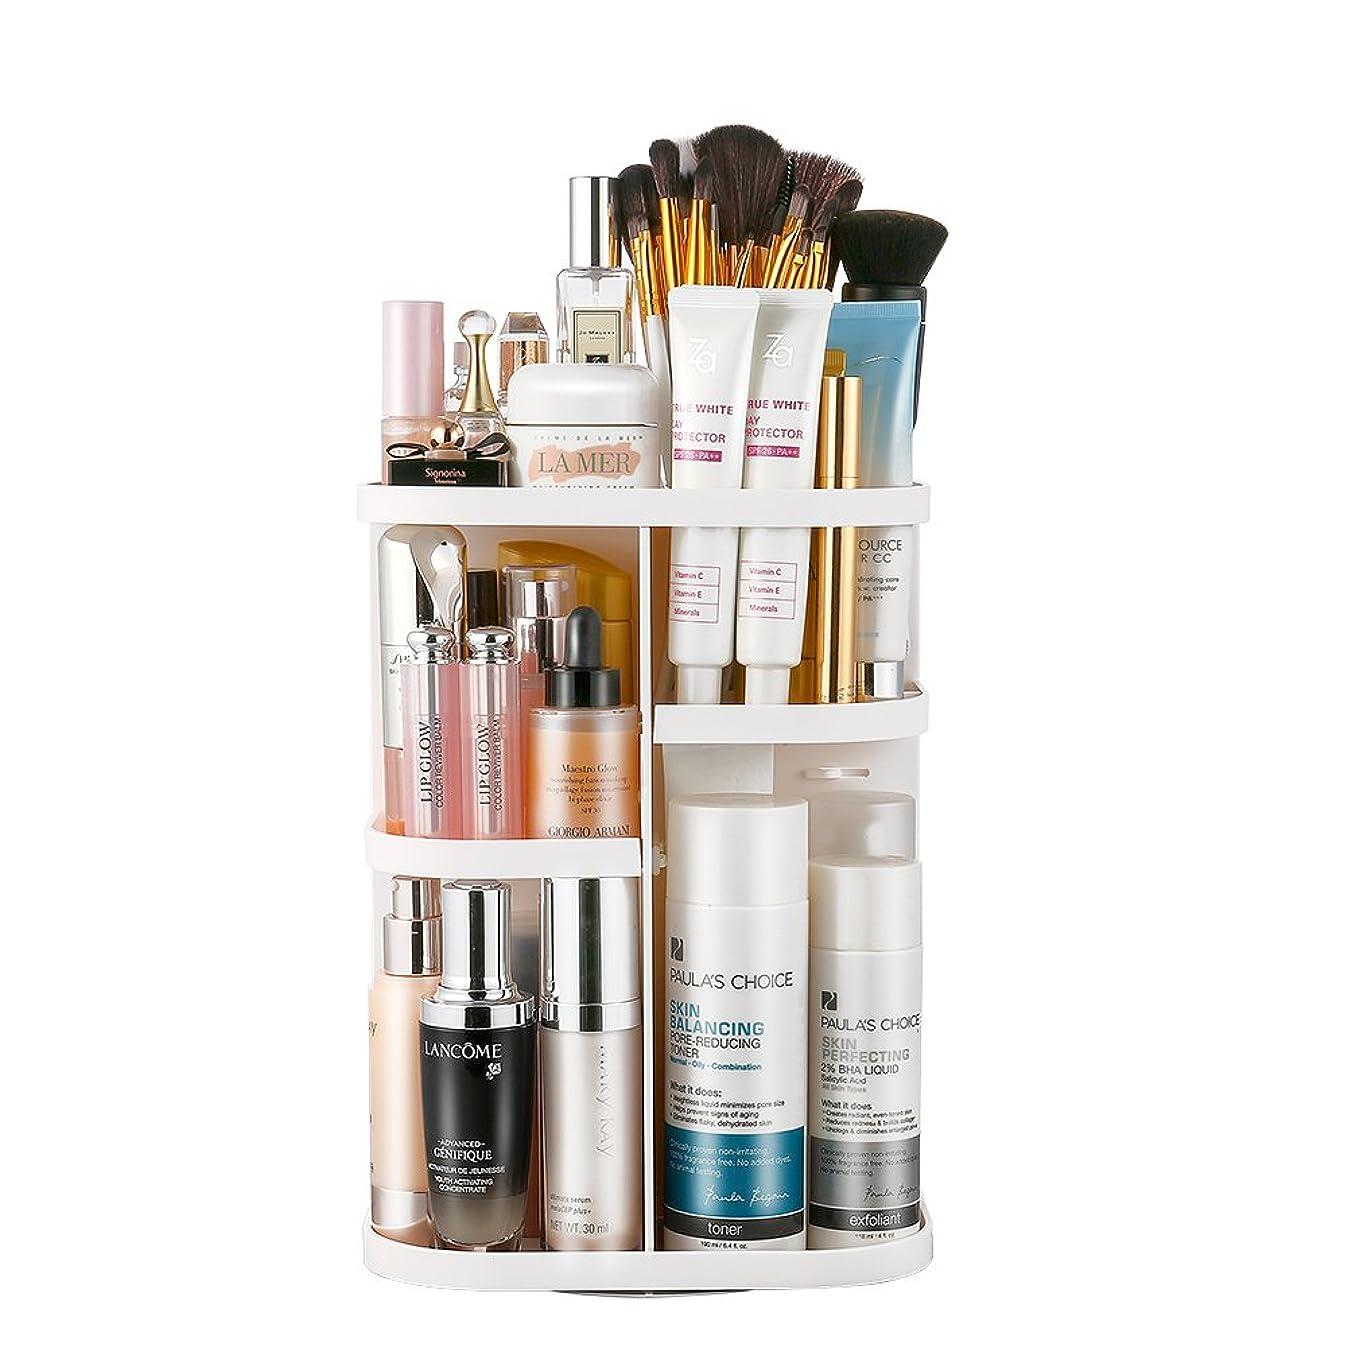 Jerrybox Vanity Organizer, 360° Rotation Makeup Organizer Spinning Holder Storage Rack for Countertop, Fits Makeup Brushes, Lipsticks, Square, White